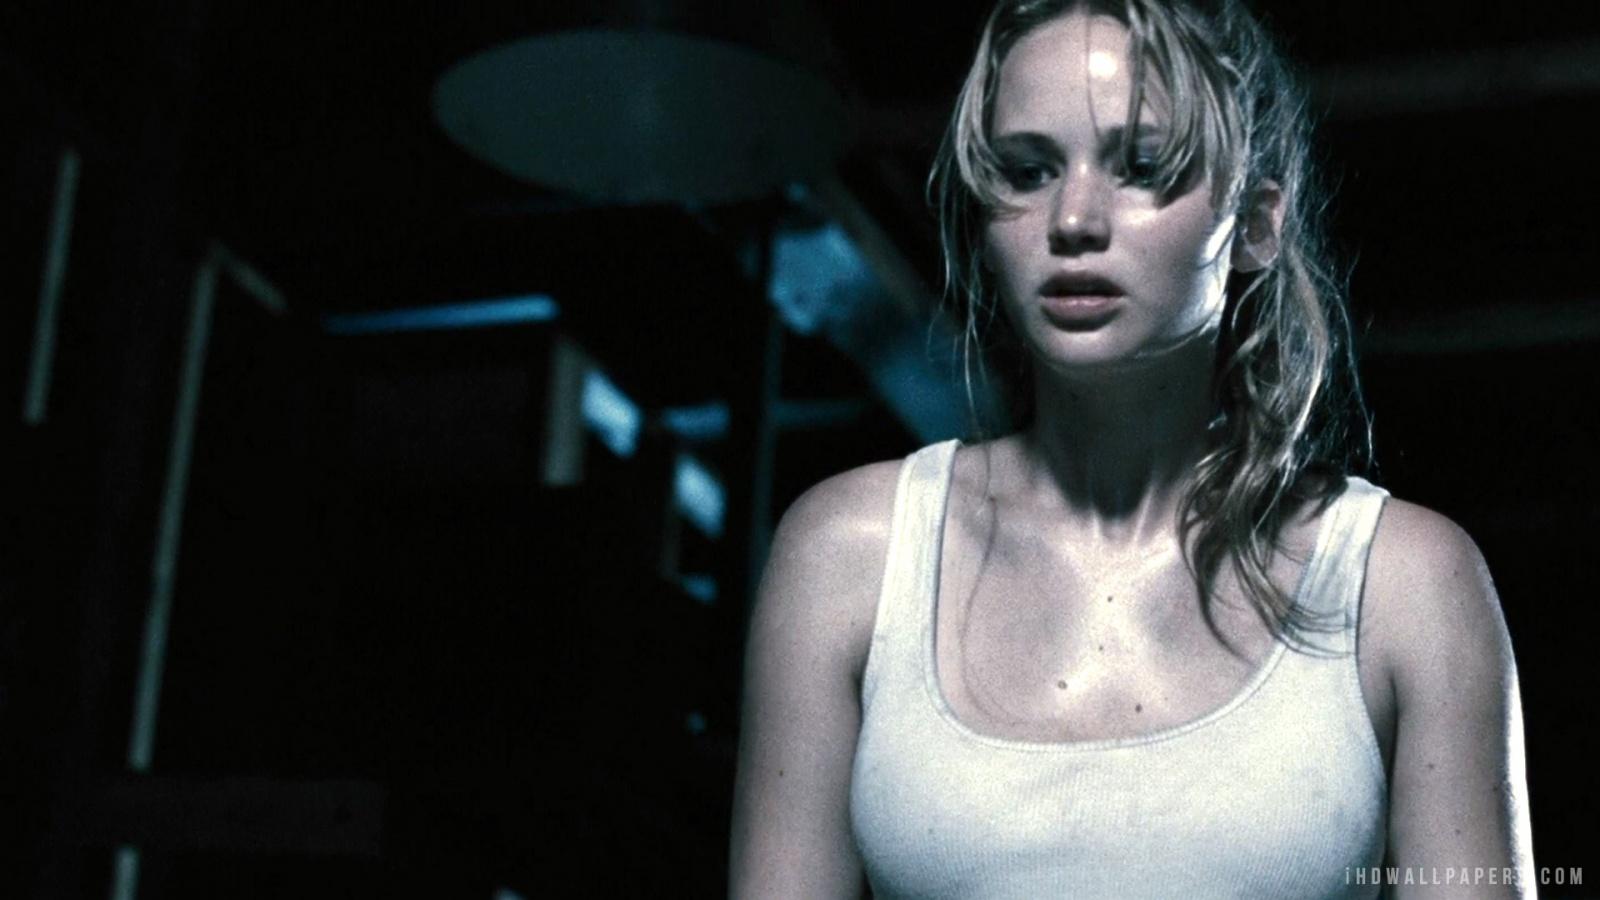 Jennifer Lawrence Horror Movie Wallpaper 1600x900